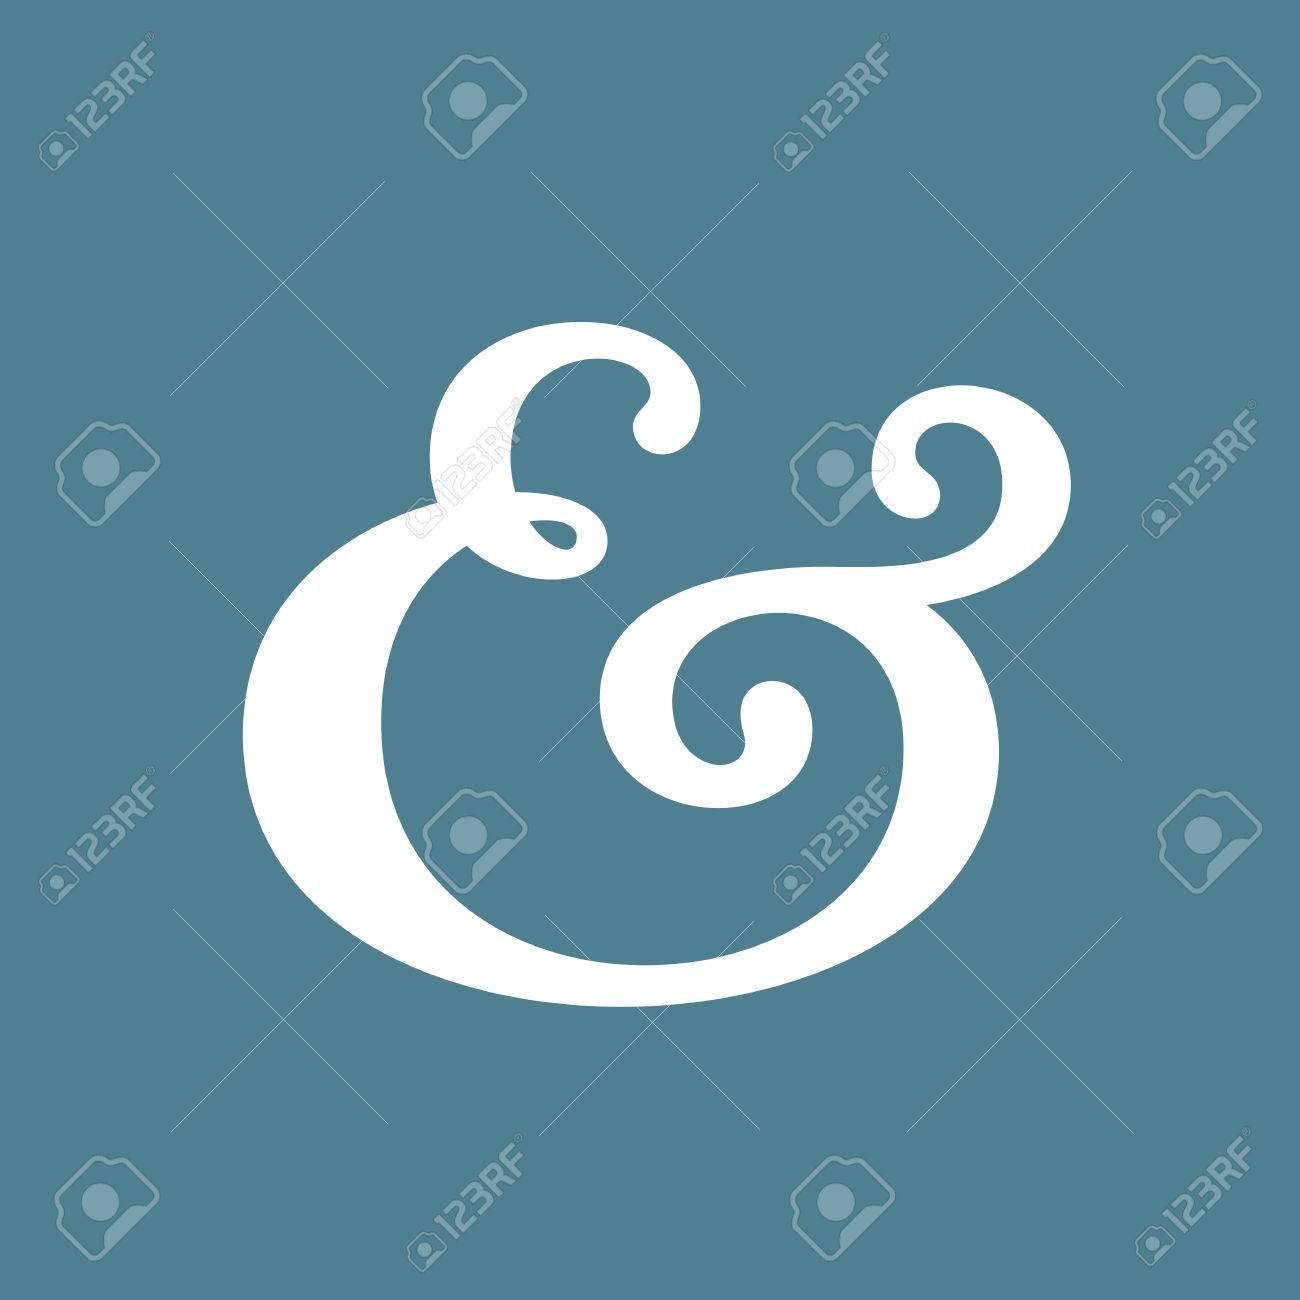 Elegant and stylish ampersand symbol for wedding invitation elegant and stylish ampersand symbol for wedding invitation vector illustration stock vector 31533409 stopboris Choice Image